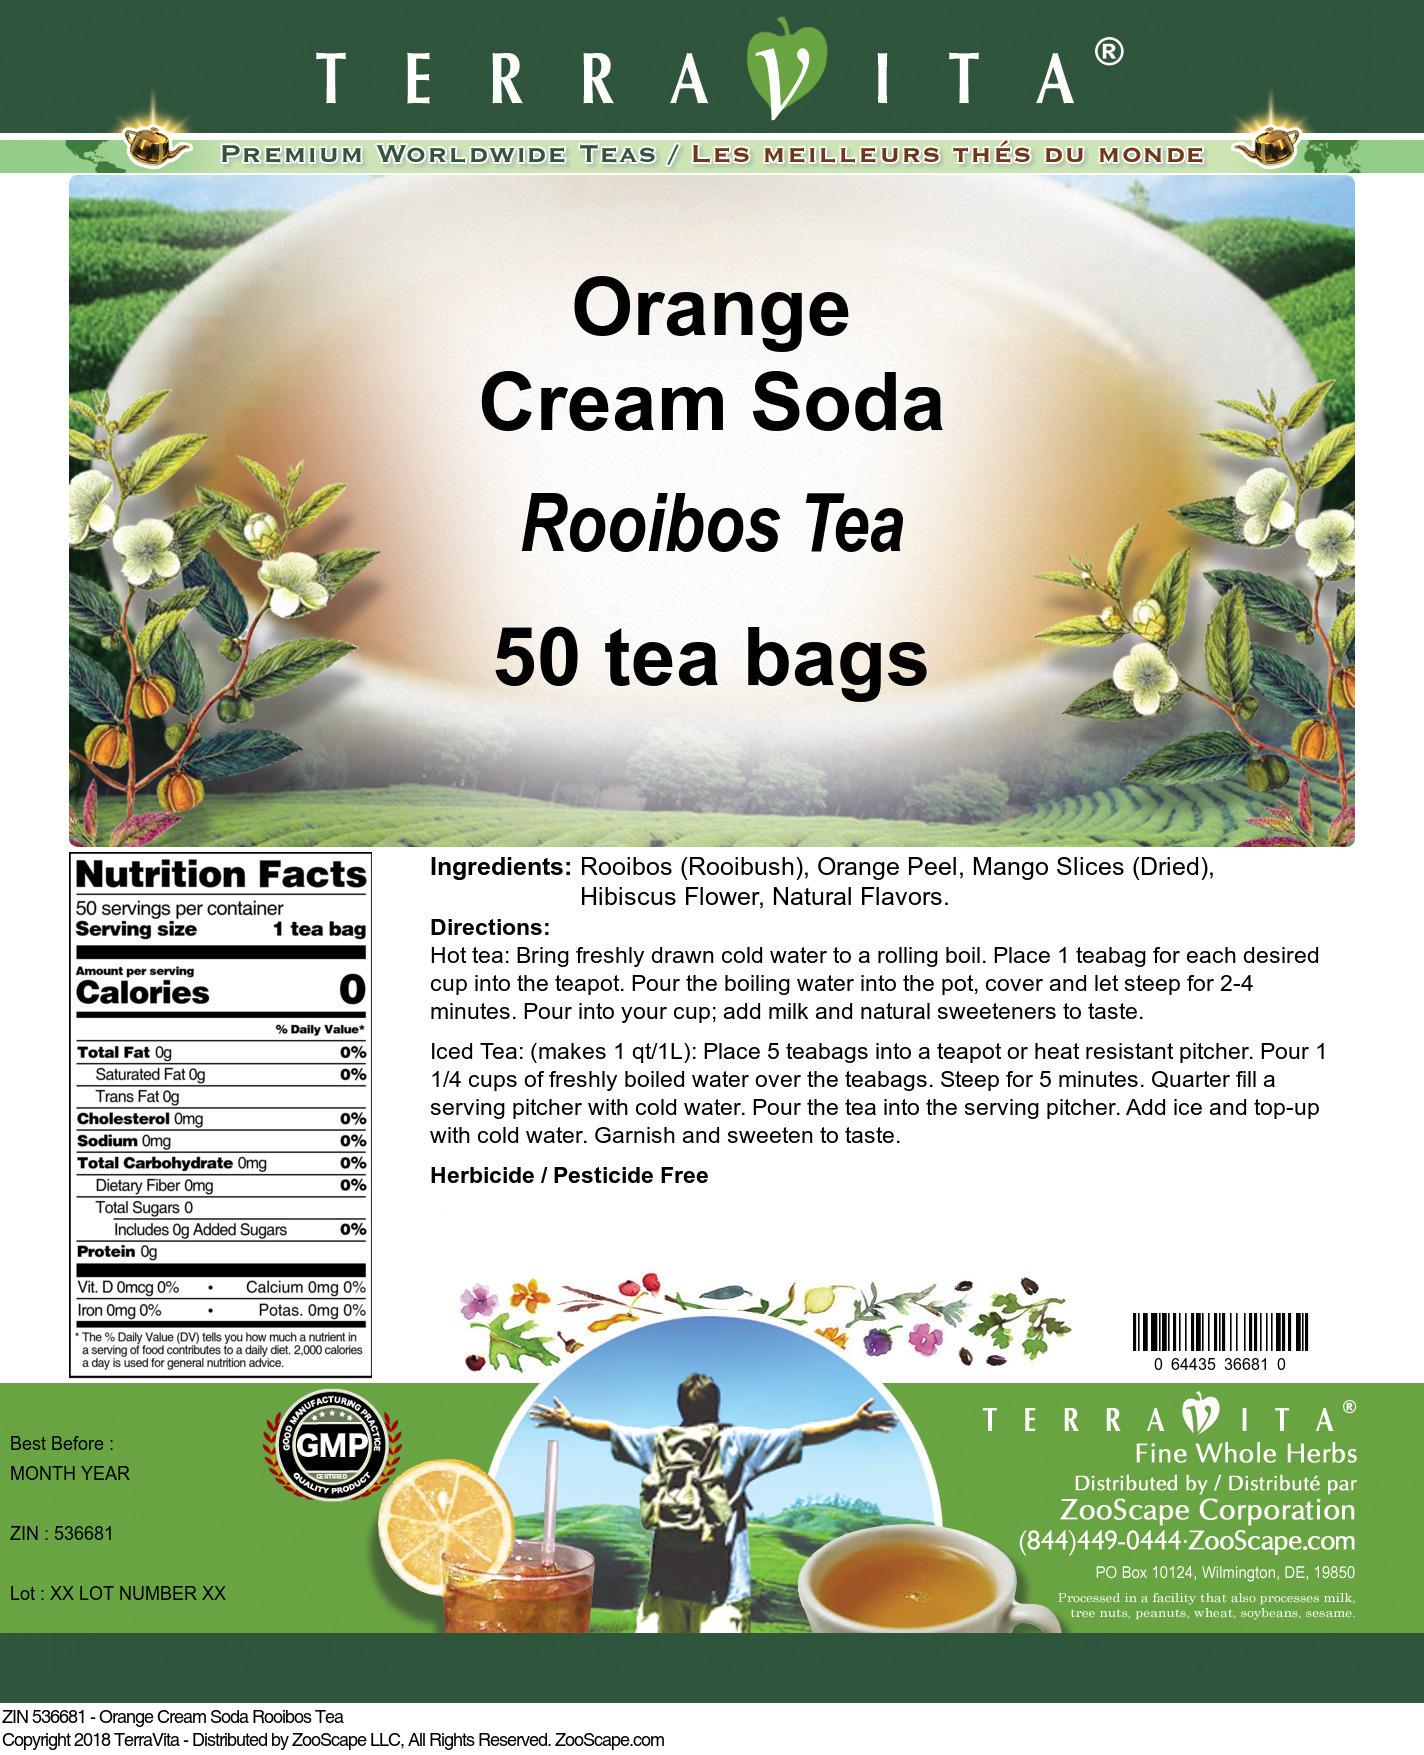 Orange Cream Soda Rooibos Tea